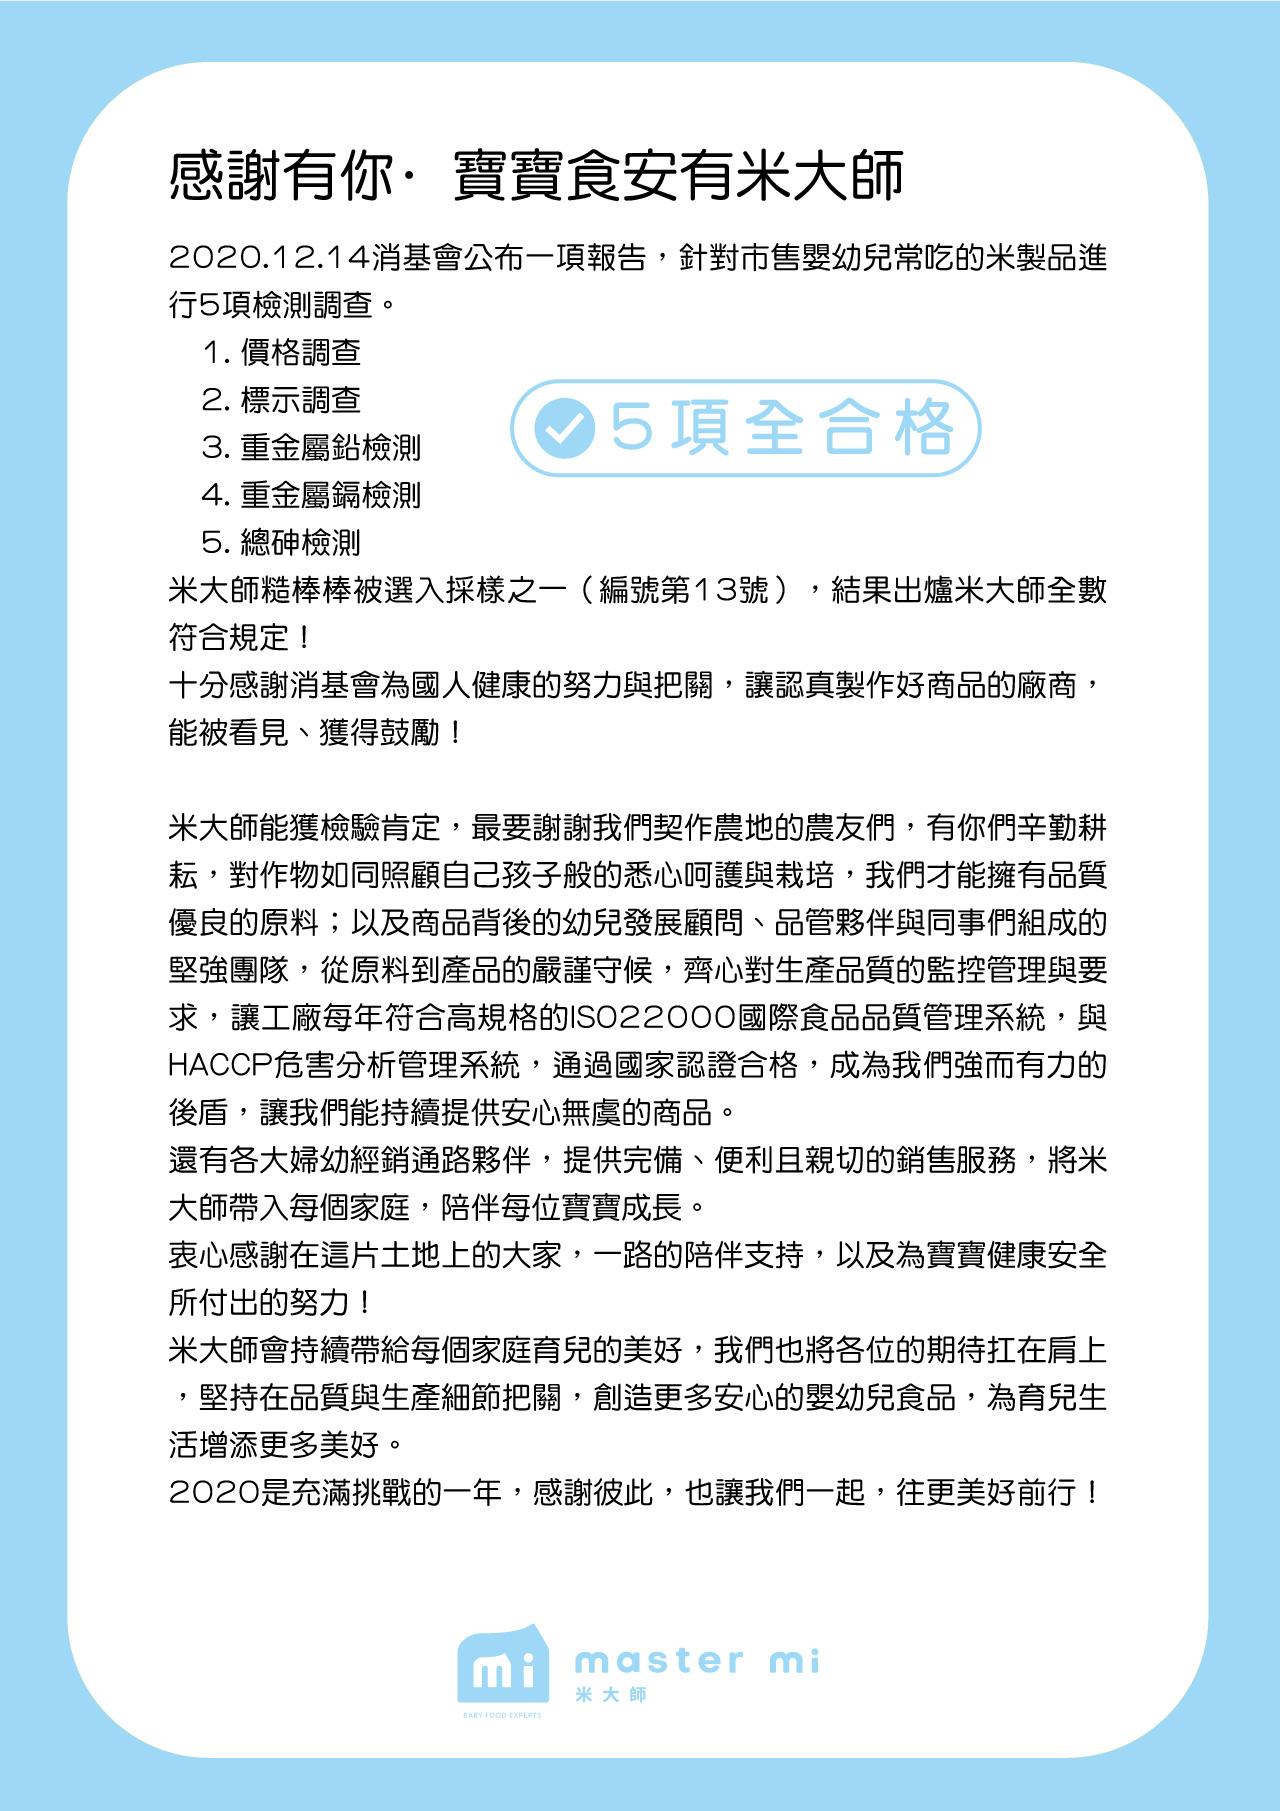 proimages/news/2020/2020米大師公告02.jpg